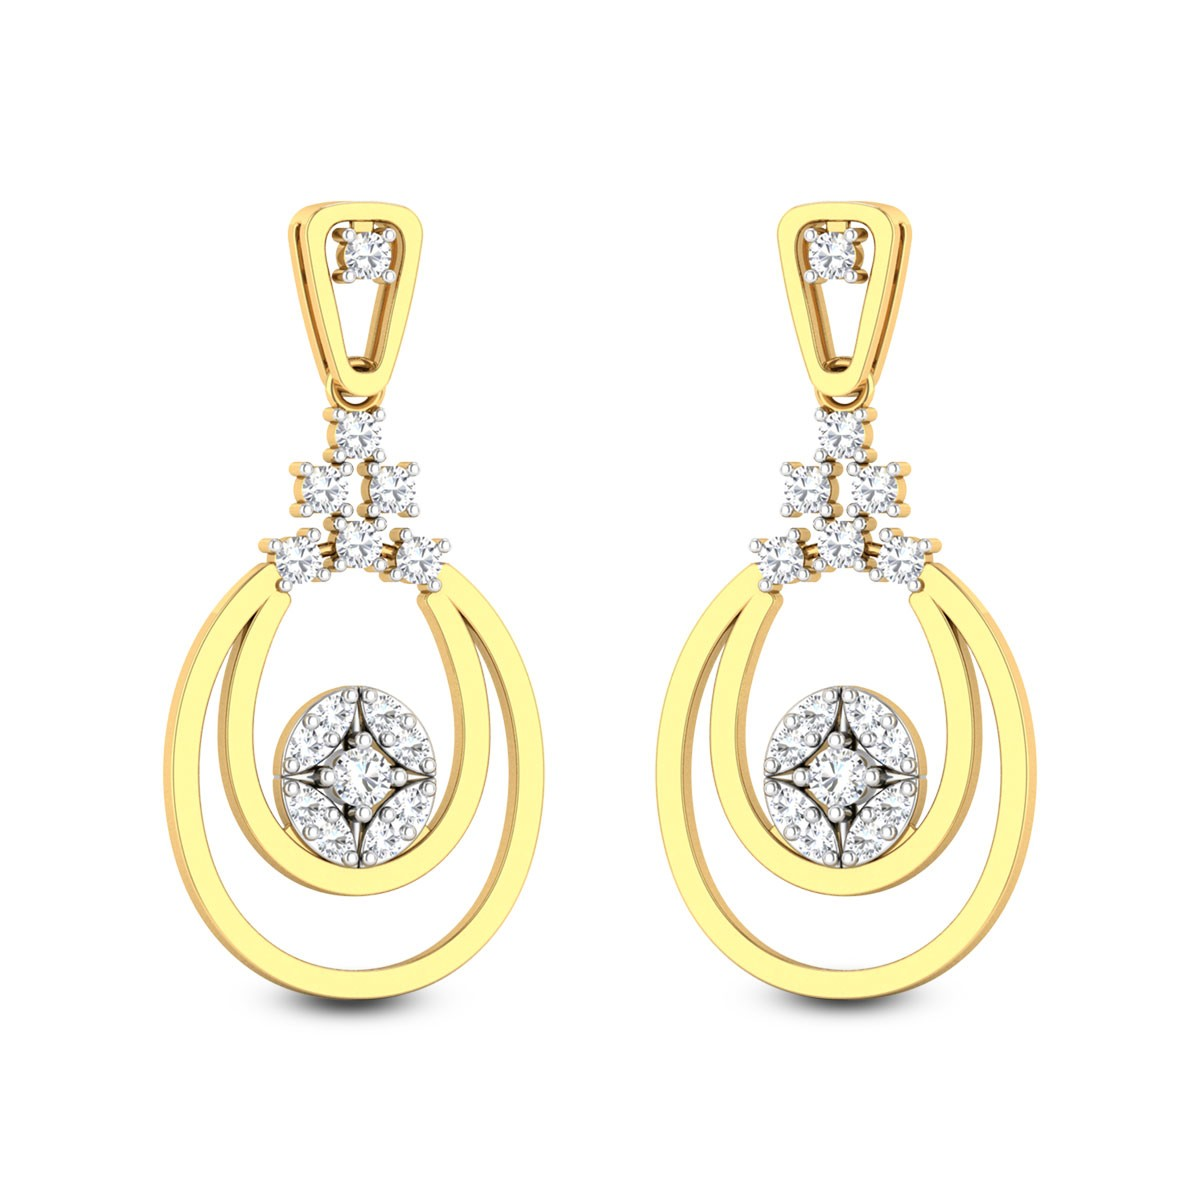 Ethereal Class Diamond Earrings